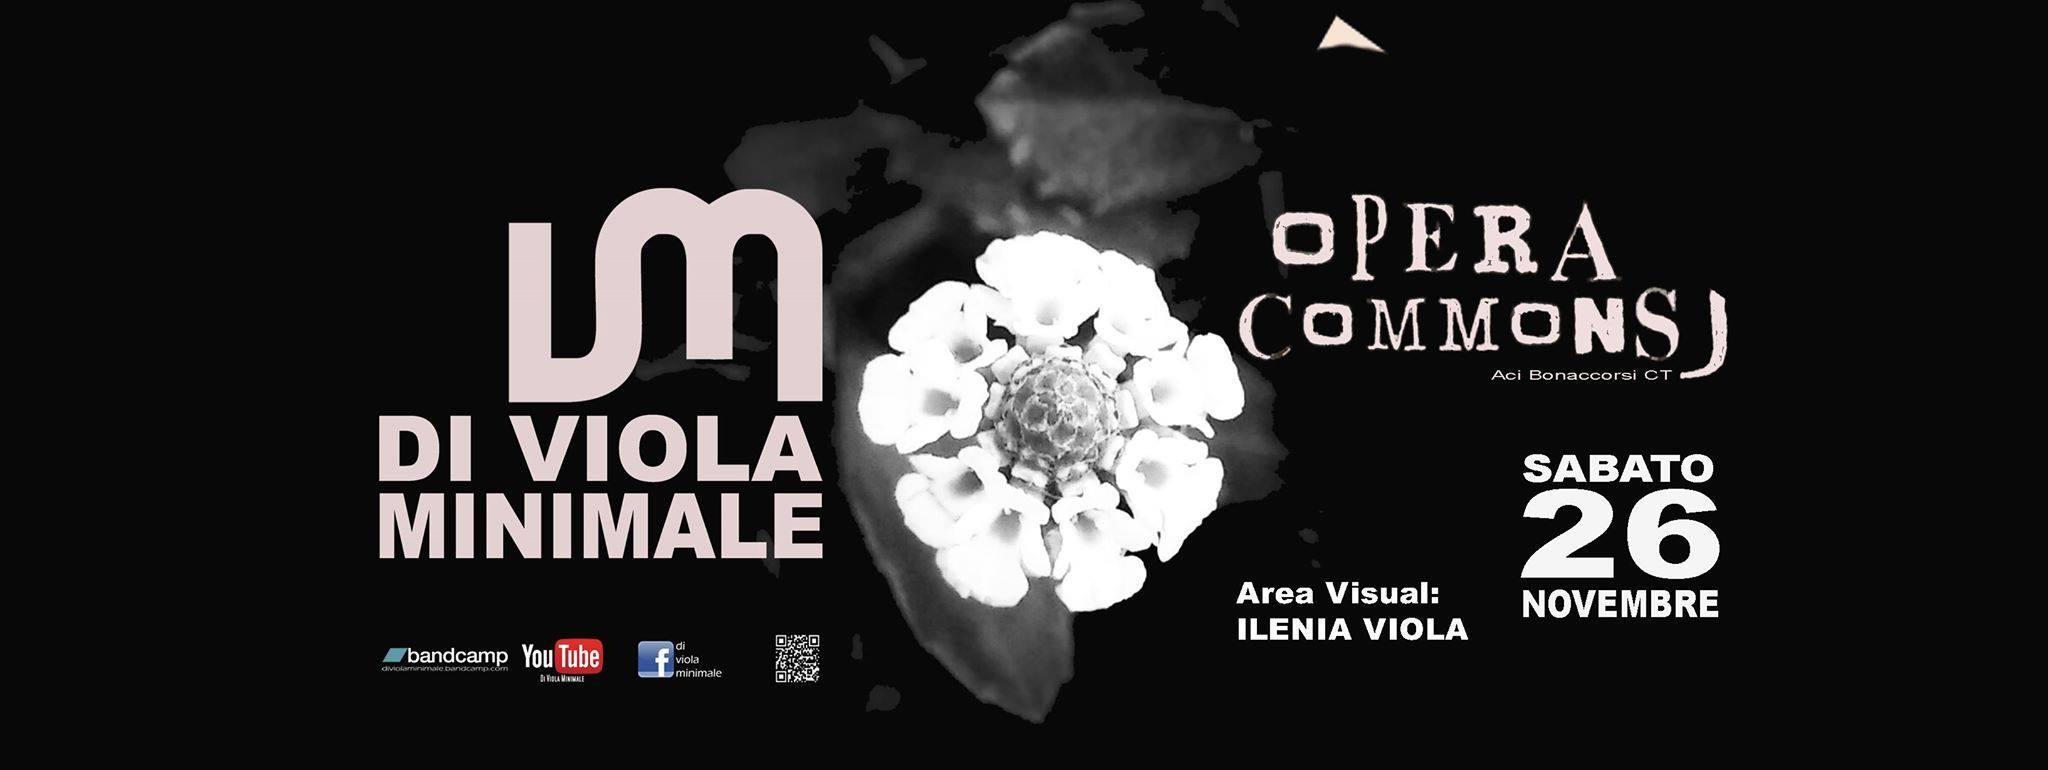 Opera Commons – Di Viola Minimale / Area visual: Ilenia Viola 26-11-2016